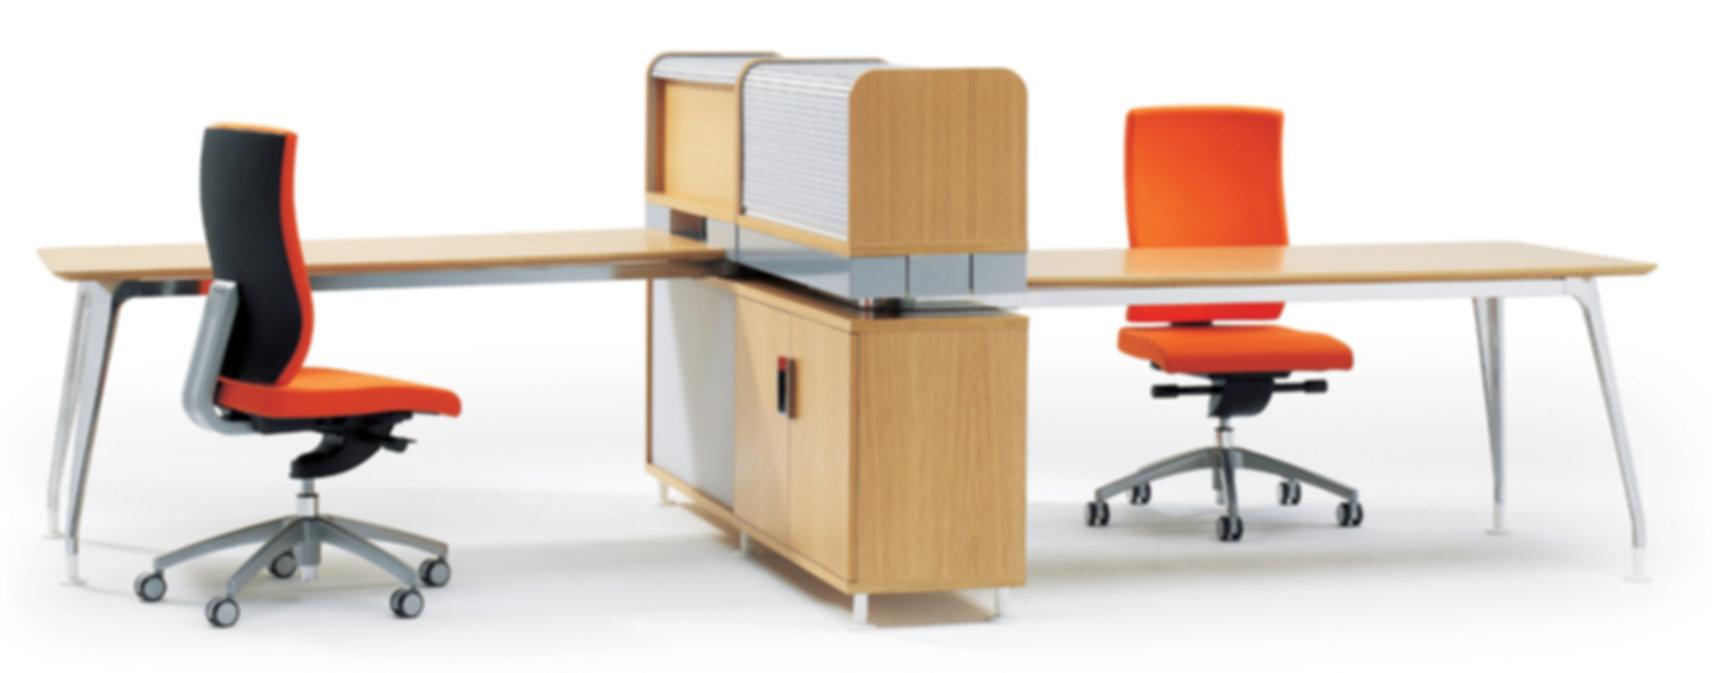 Desks Wide.jpg